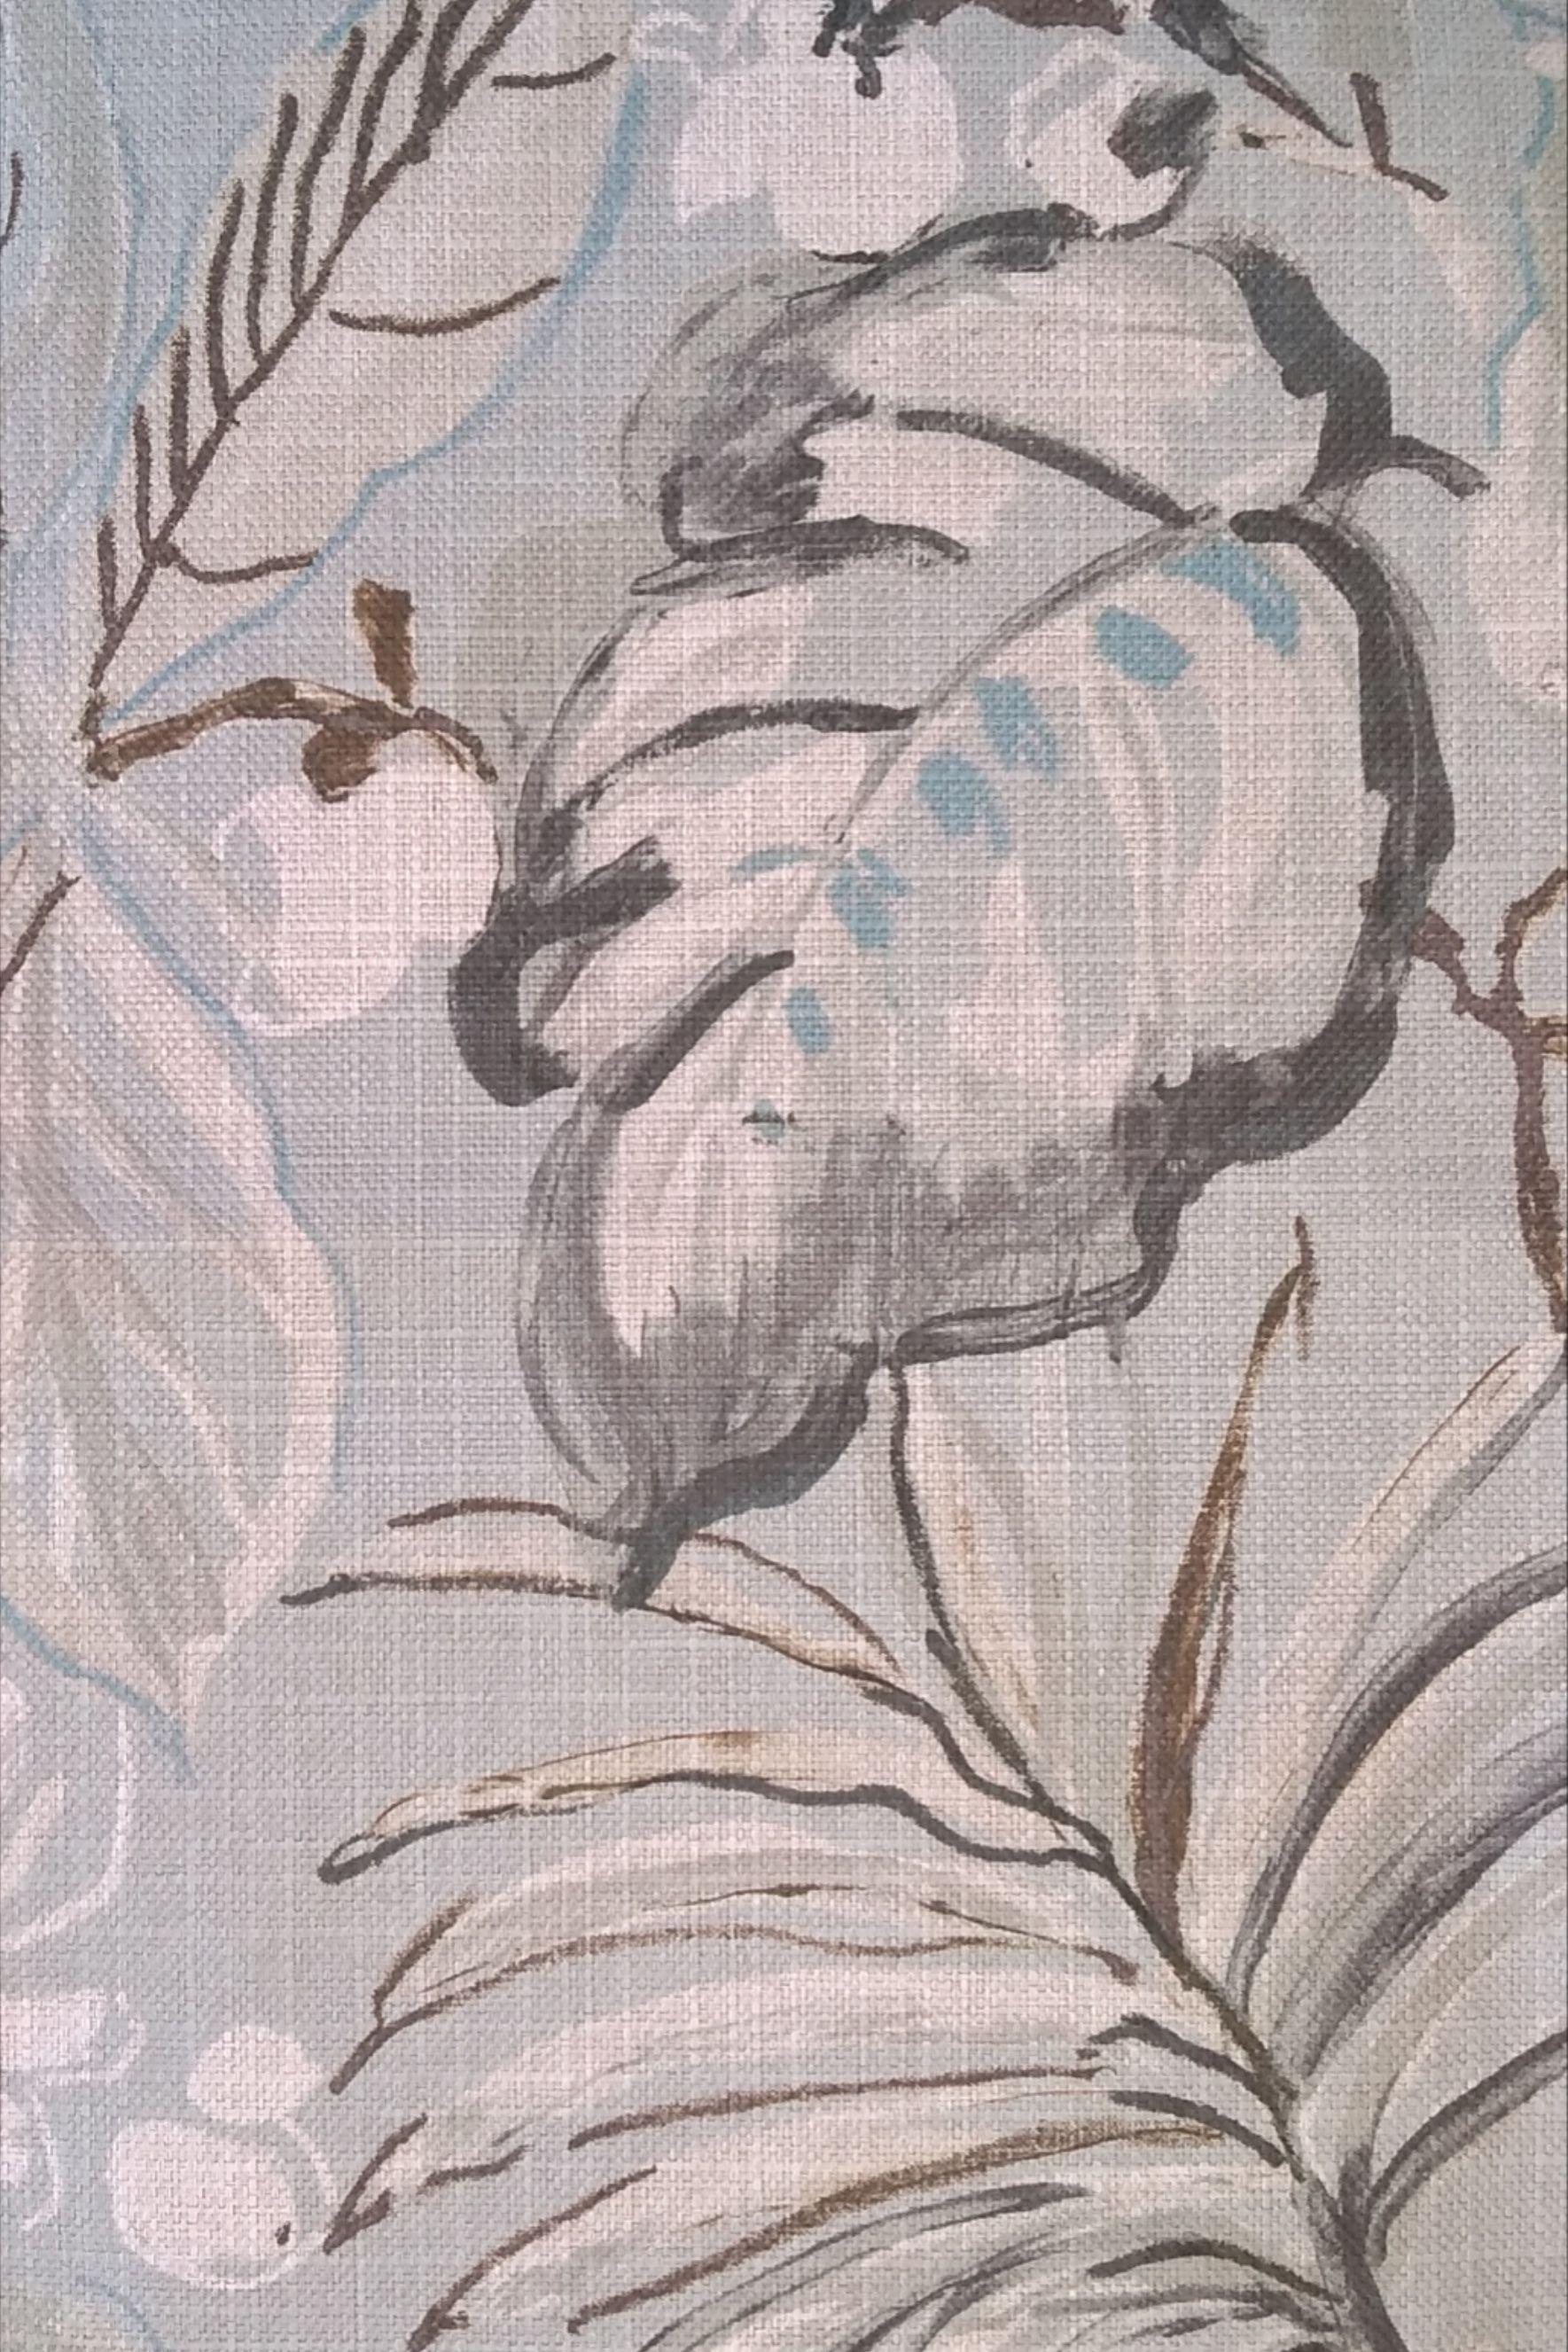 New Arrival Magnolia Fabrics Fabric Fabric Store